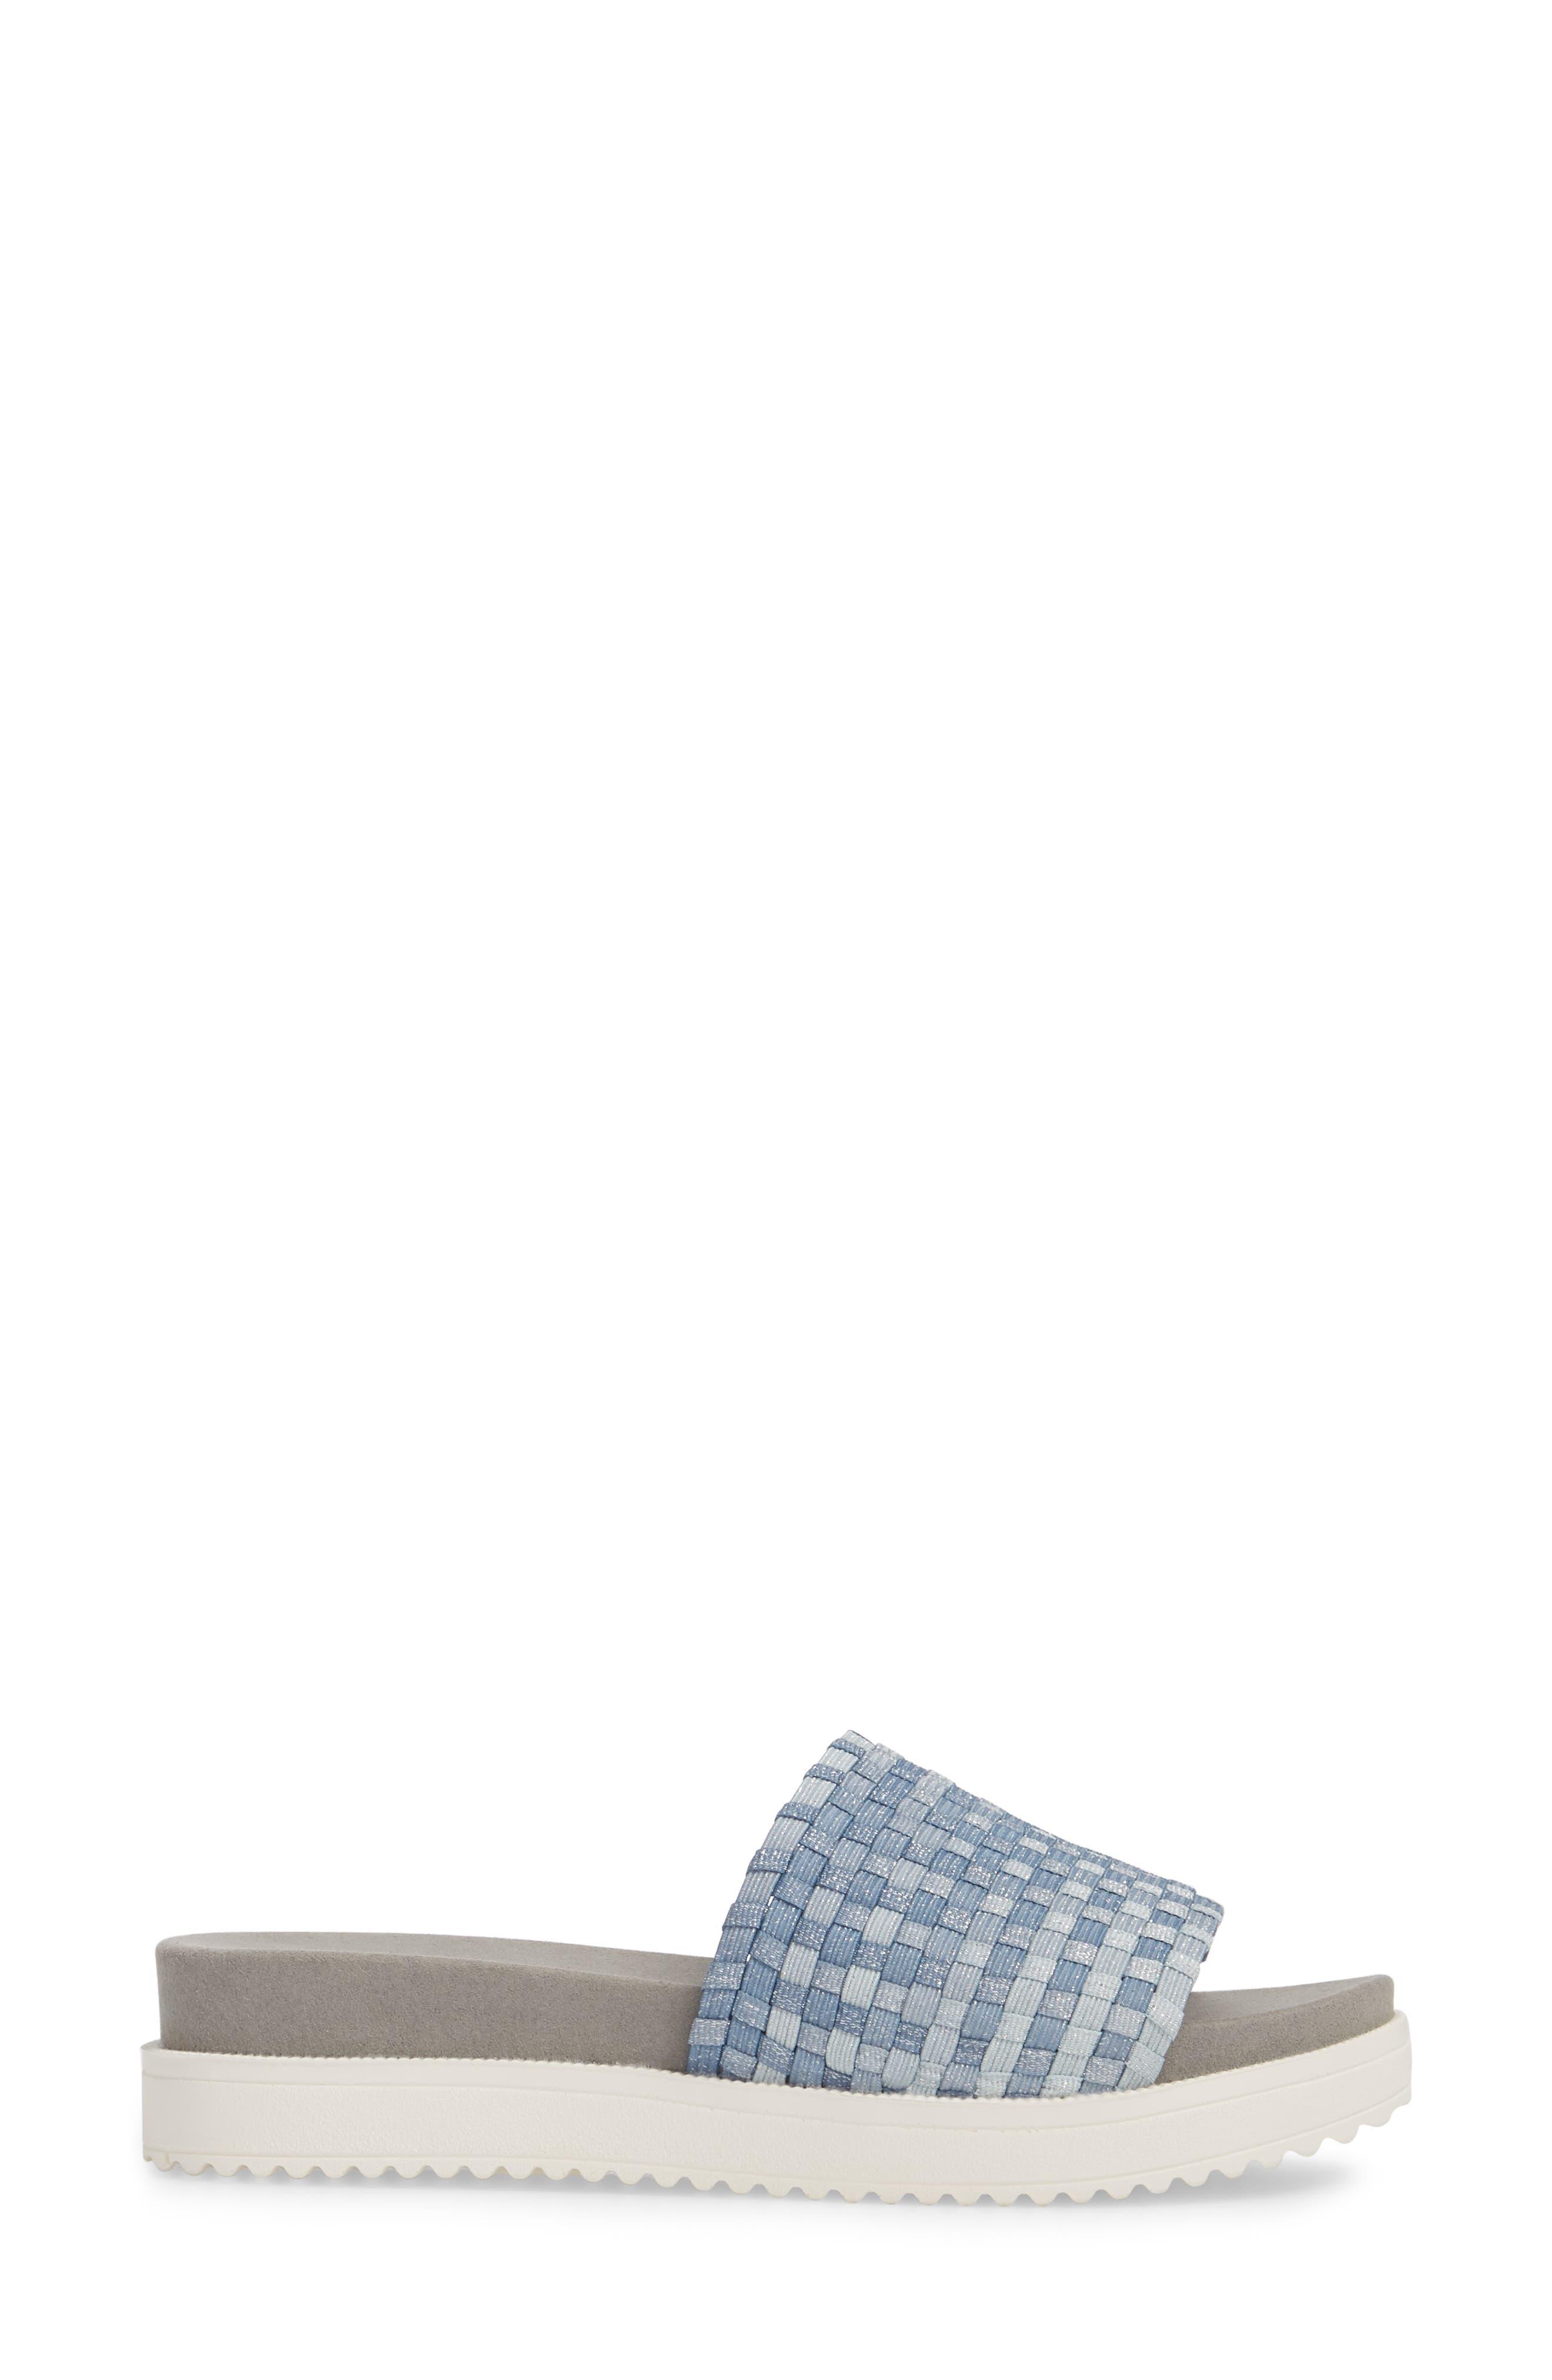 BERNIE MEV.,                             Capri Slide Sandal,                             Alternate thumbnail 3, color,                             CLOUD SHIMMER FABRIC